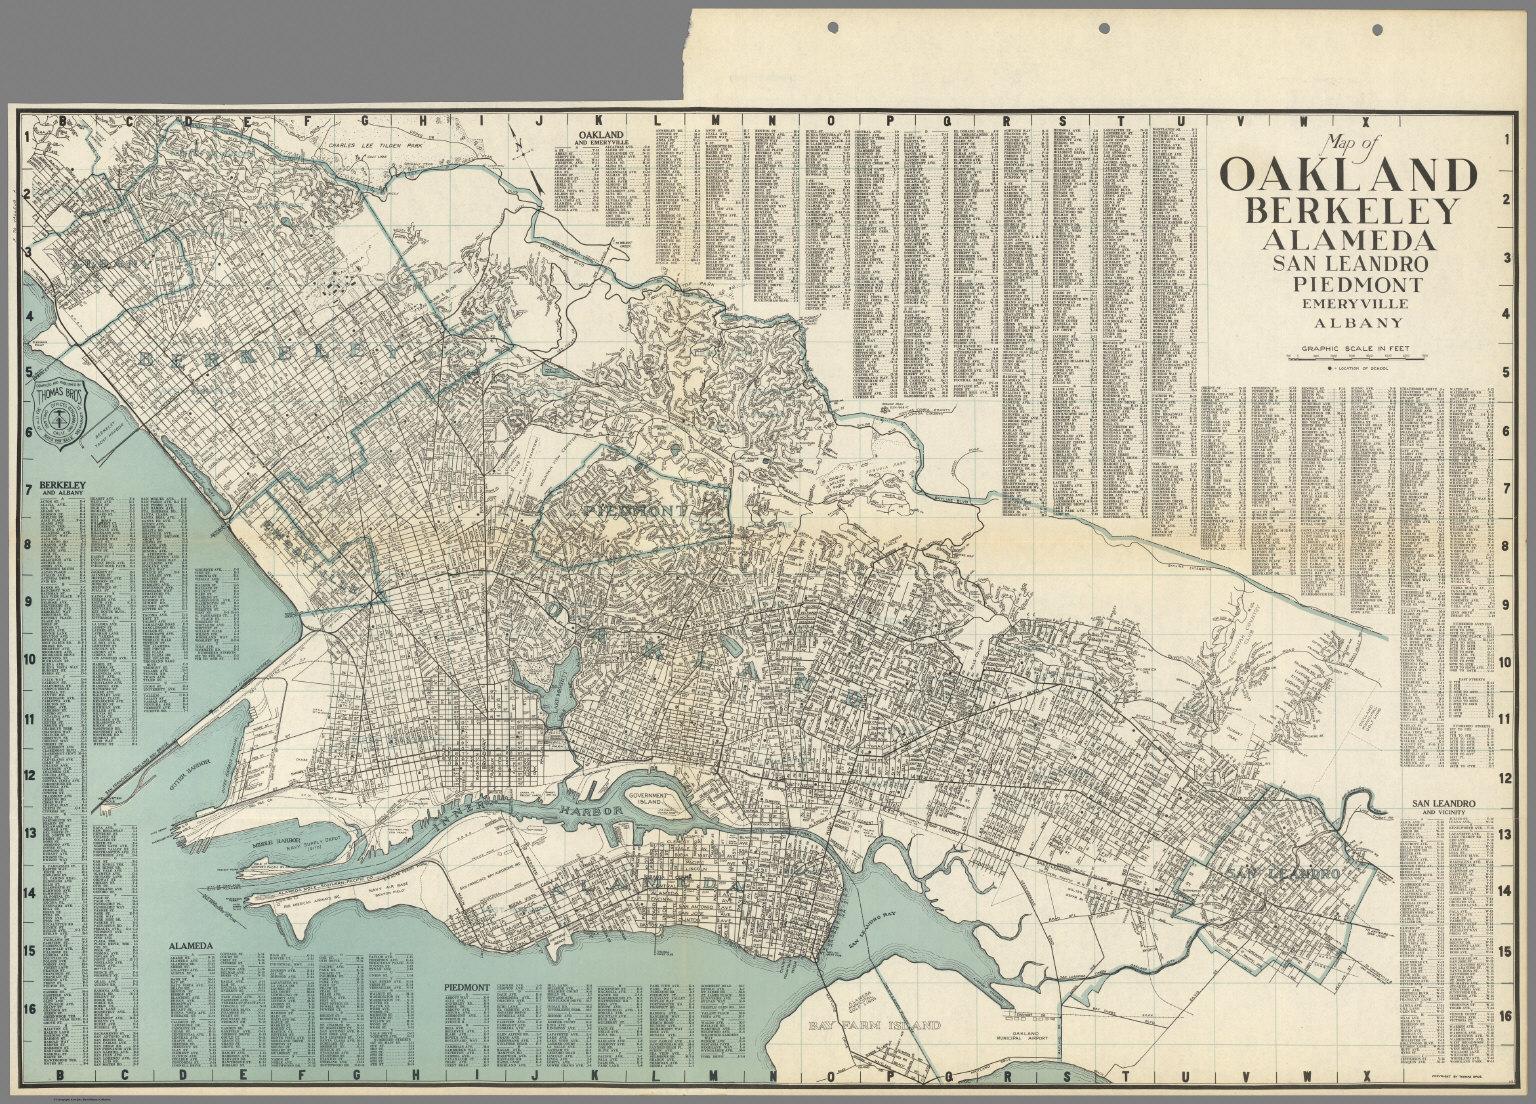 Map of Oakland, Berkeley, Alameda, San Leandro, Piedmont ... San Leandro Map on downey map, burlingame map, santee map, marin city map, la costa valley map, bakersfield map, pico rivera map, ukiah map, san lorenzo map, pleasanton map, mission san jose map, san pablo map, big sur map, benicia map, north county san diego map, south bay cities map, milpitas map, gardena map, south san diego map, whittier map,